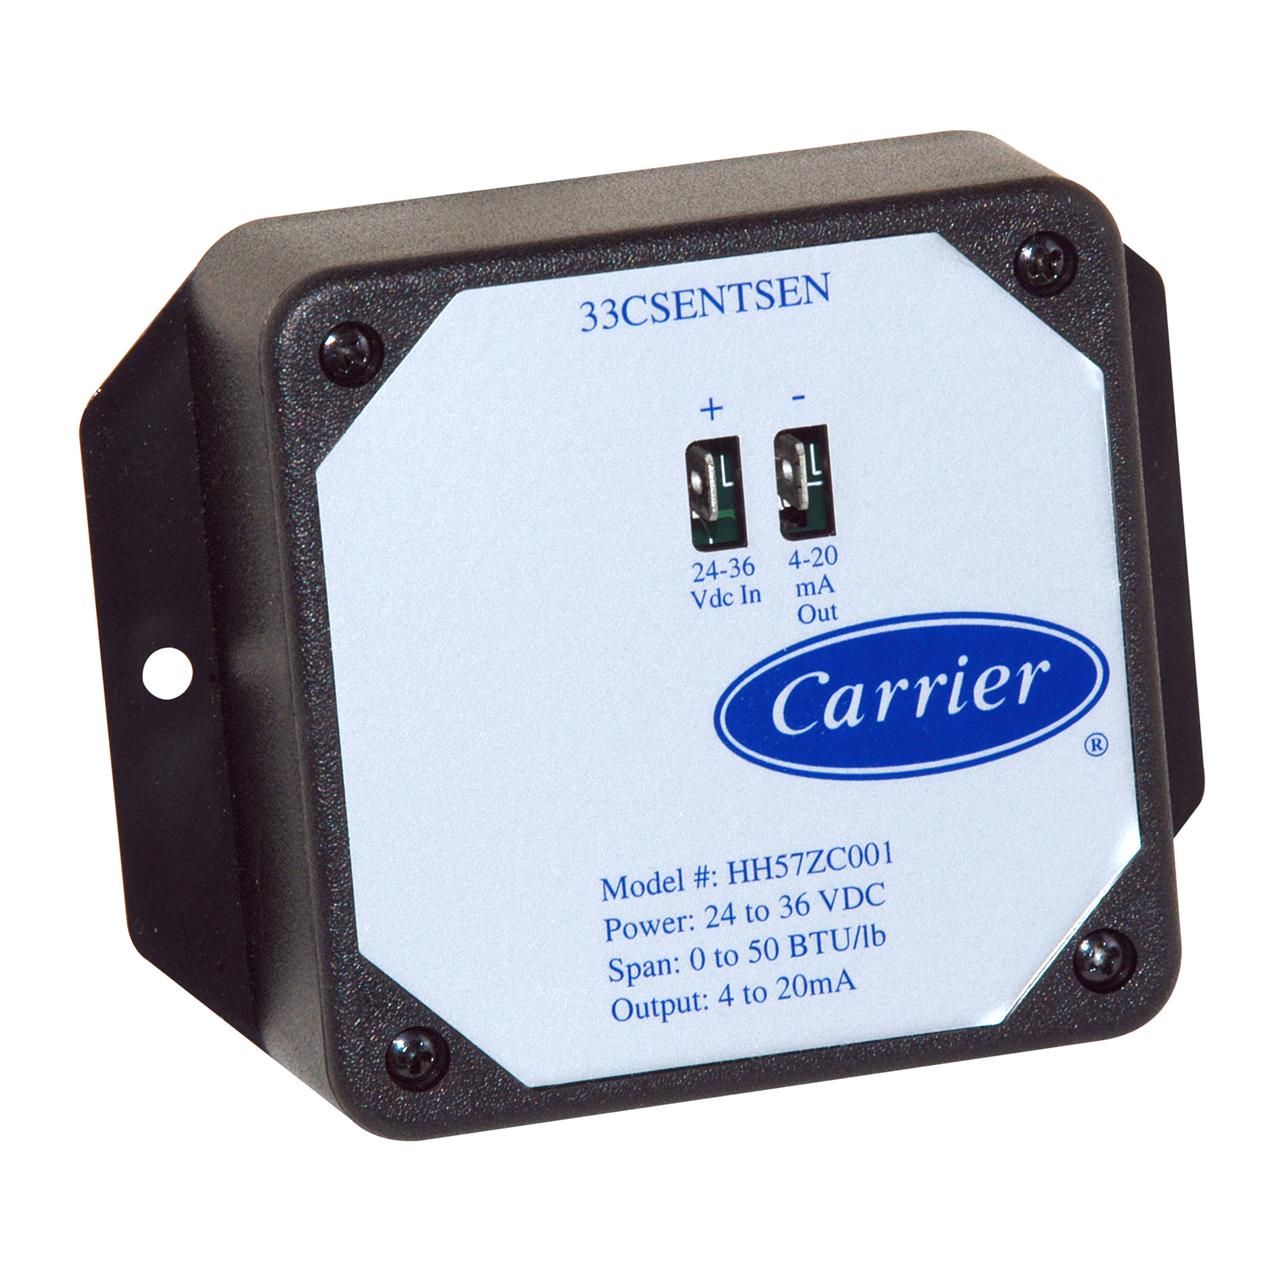 carrier-33CSENTSEN-enthalpy-switch-receiver